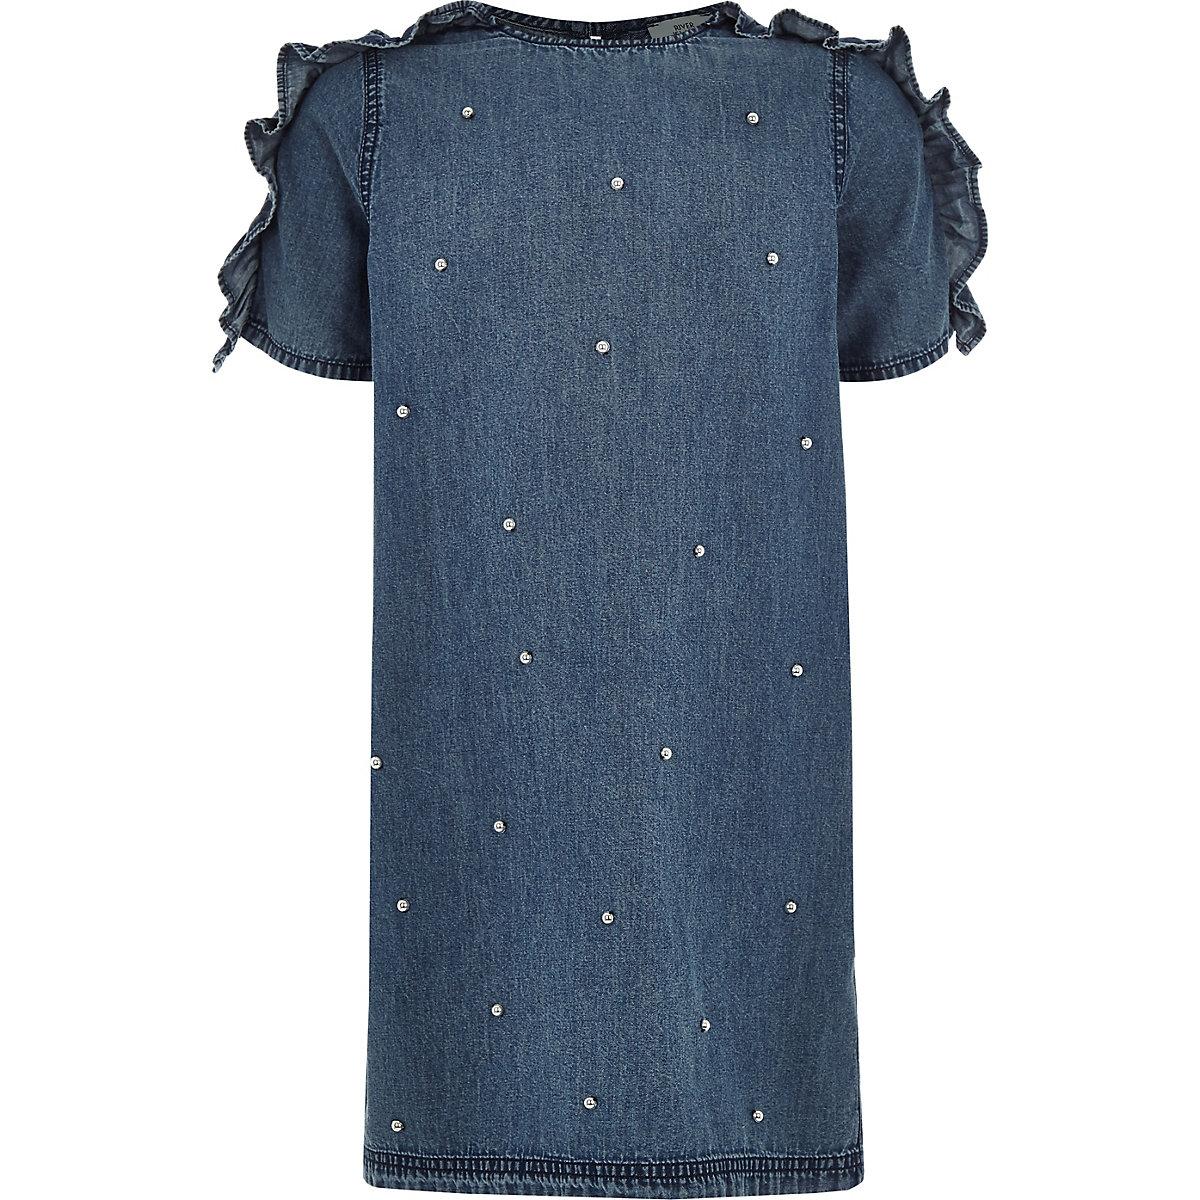 Girls denim pearl ruffle sleeve T-shirt dress